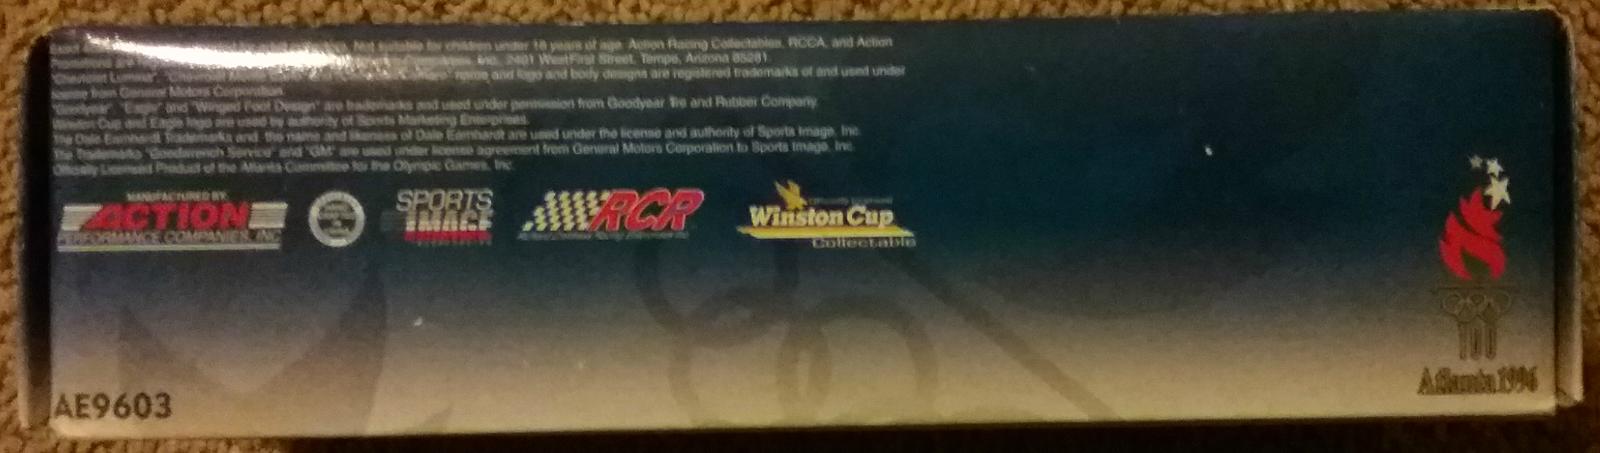 Dale Earnhardt NASCAR collection Multiple Item Lot -